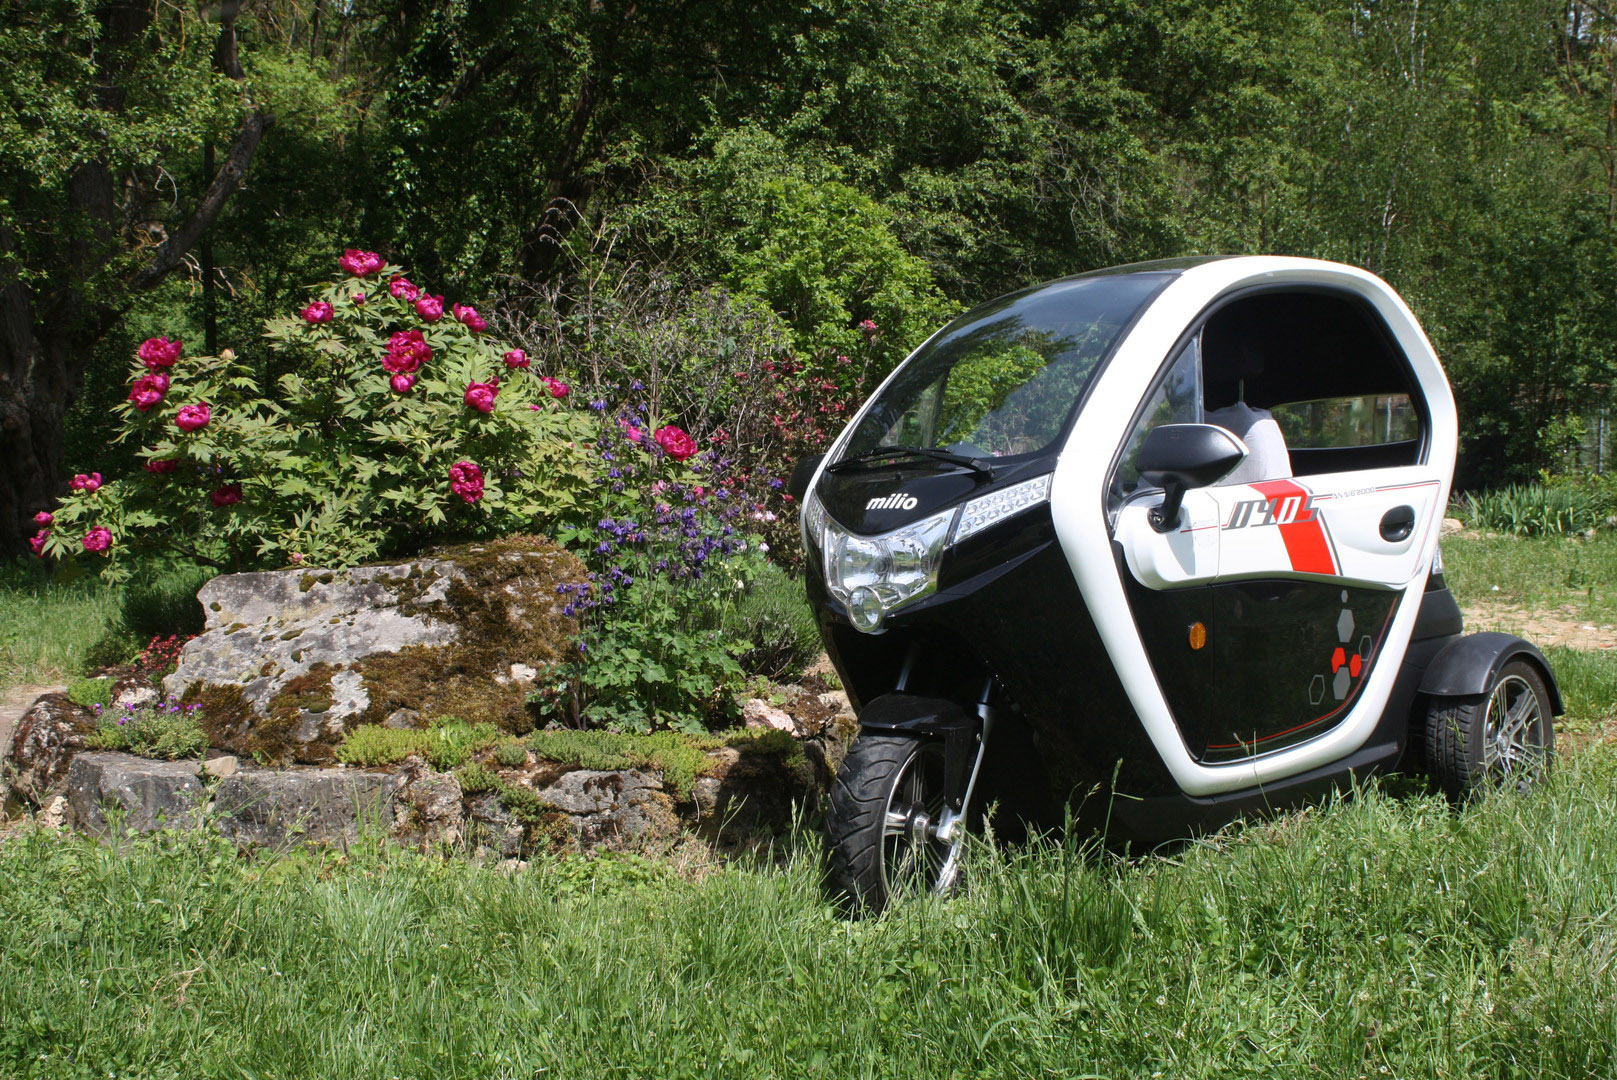 autofahren ohne f hrerschein 25km mofa auto 25kmh kabinenroller 25km. Black Bedroom Furniture Sets. Home Design Ideas